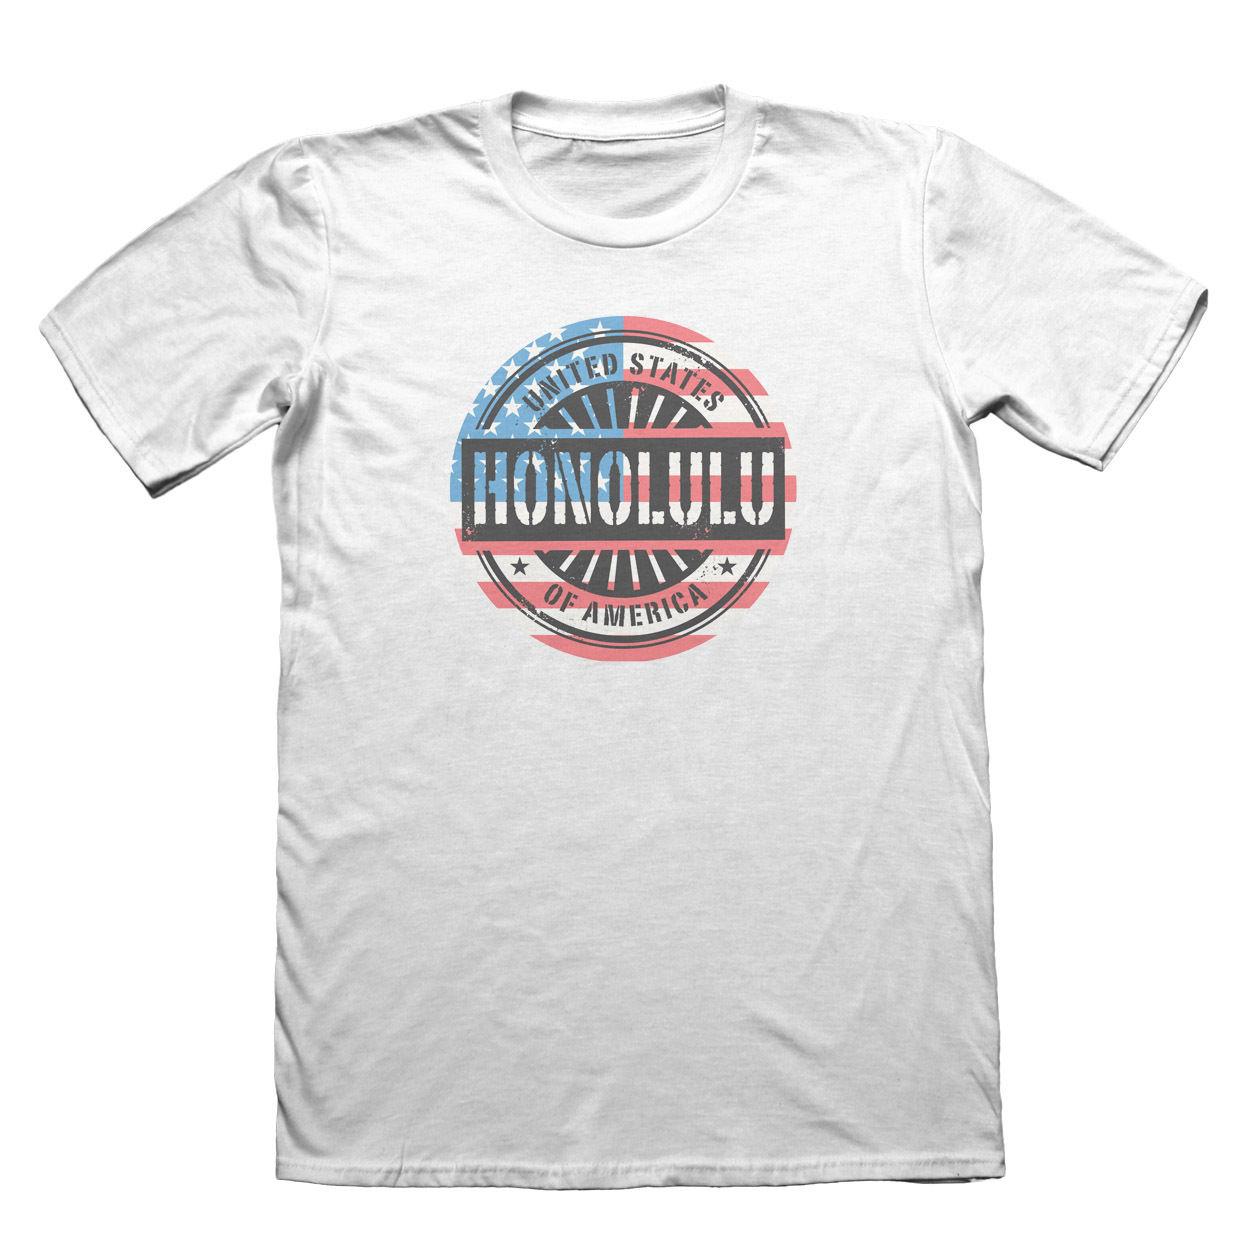 Honolulu Hawaii USA T-Shirt - Mens Fathers Day Christmas Popular Style Man T Shirt Top Tee New 2018 Fashion Hot